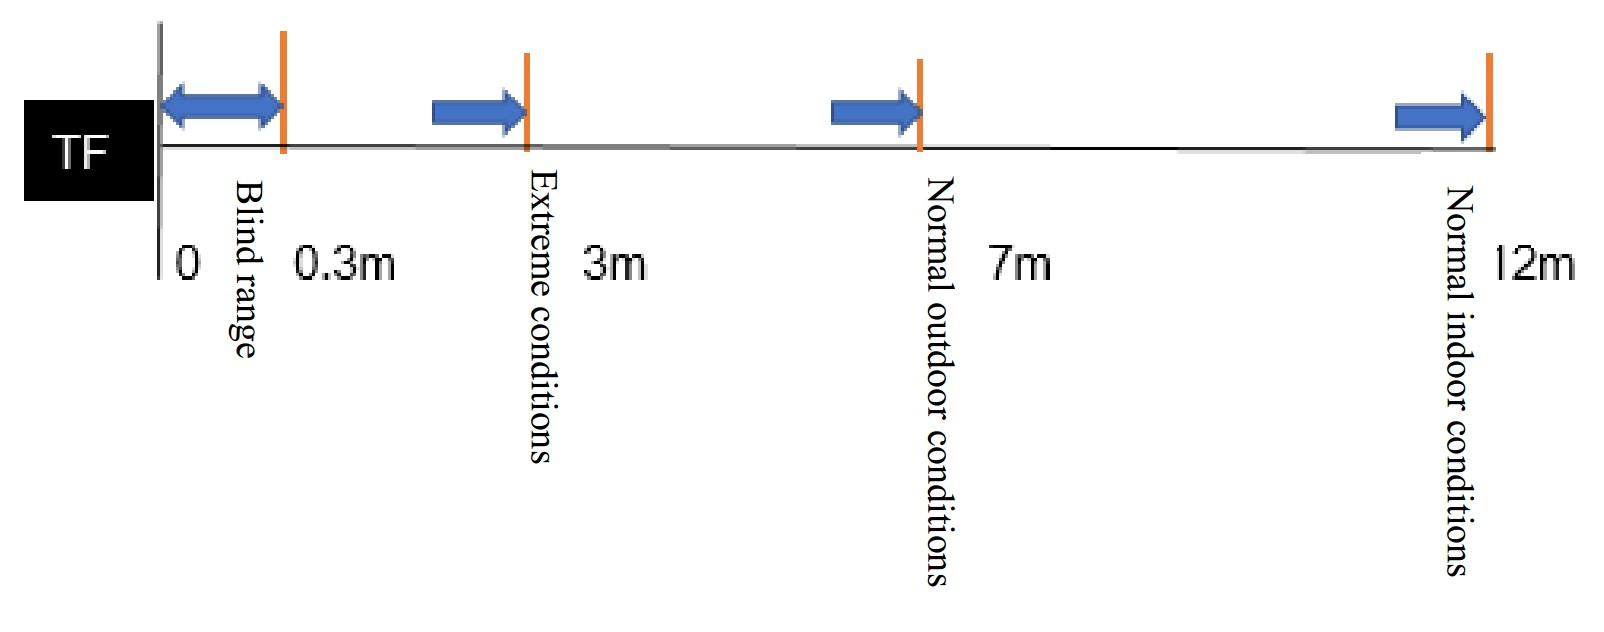 Tf Mini Lidartof Laser Range Sensor Schematic Diagram Measurement